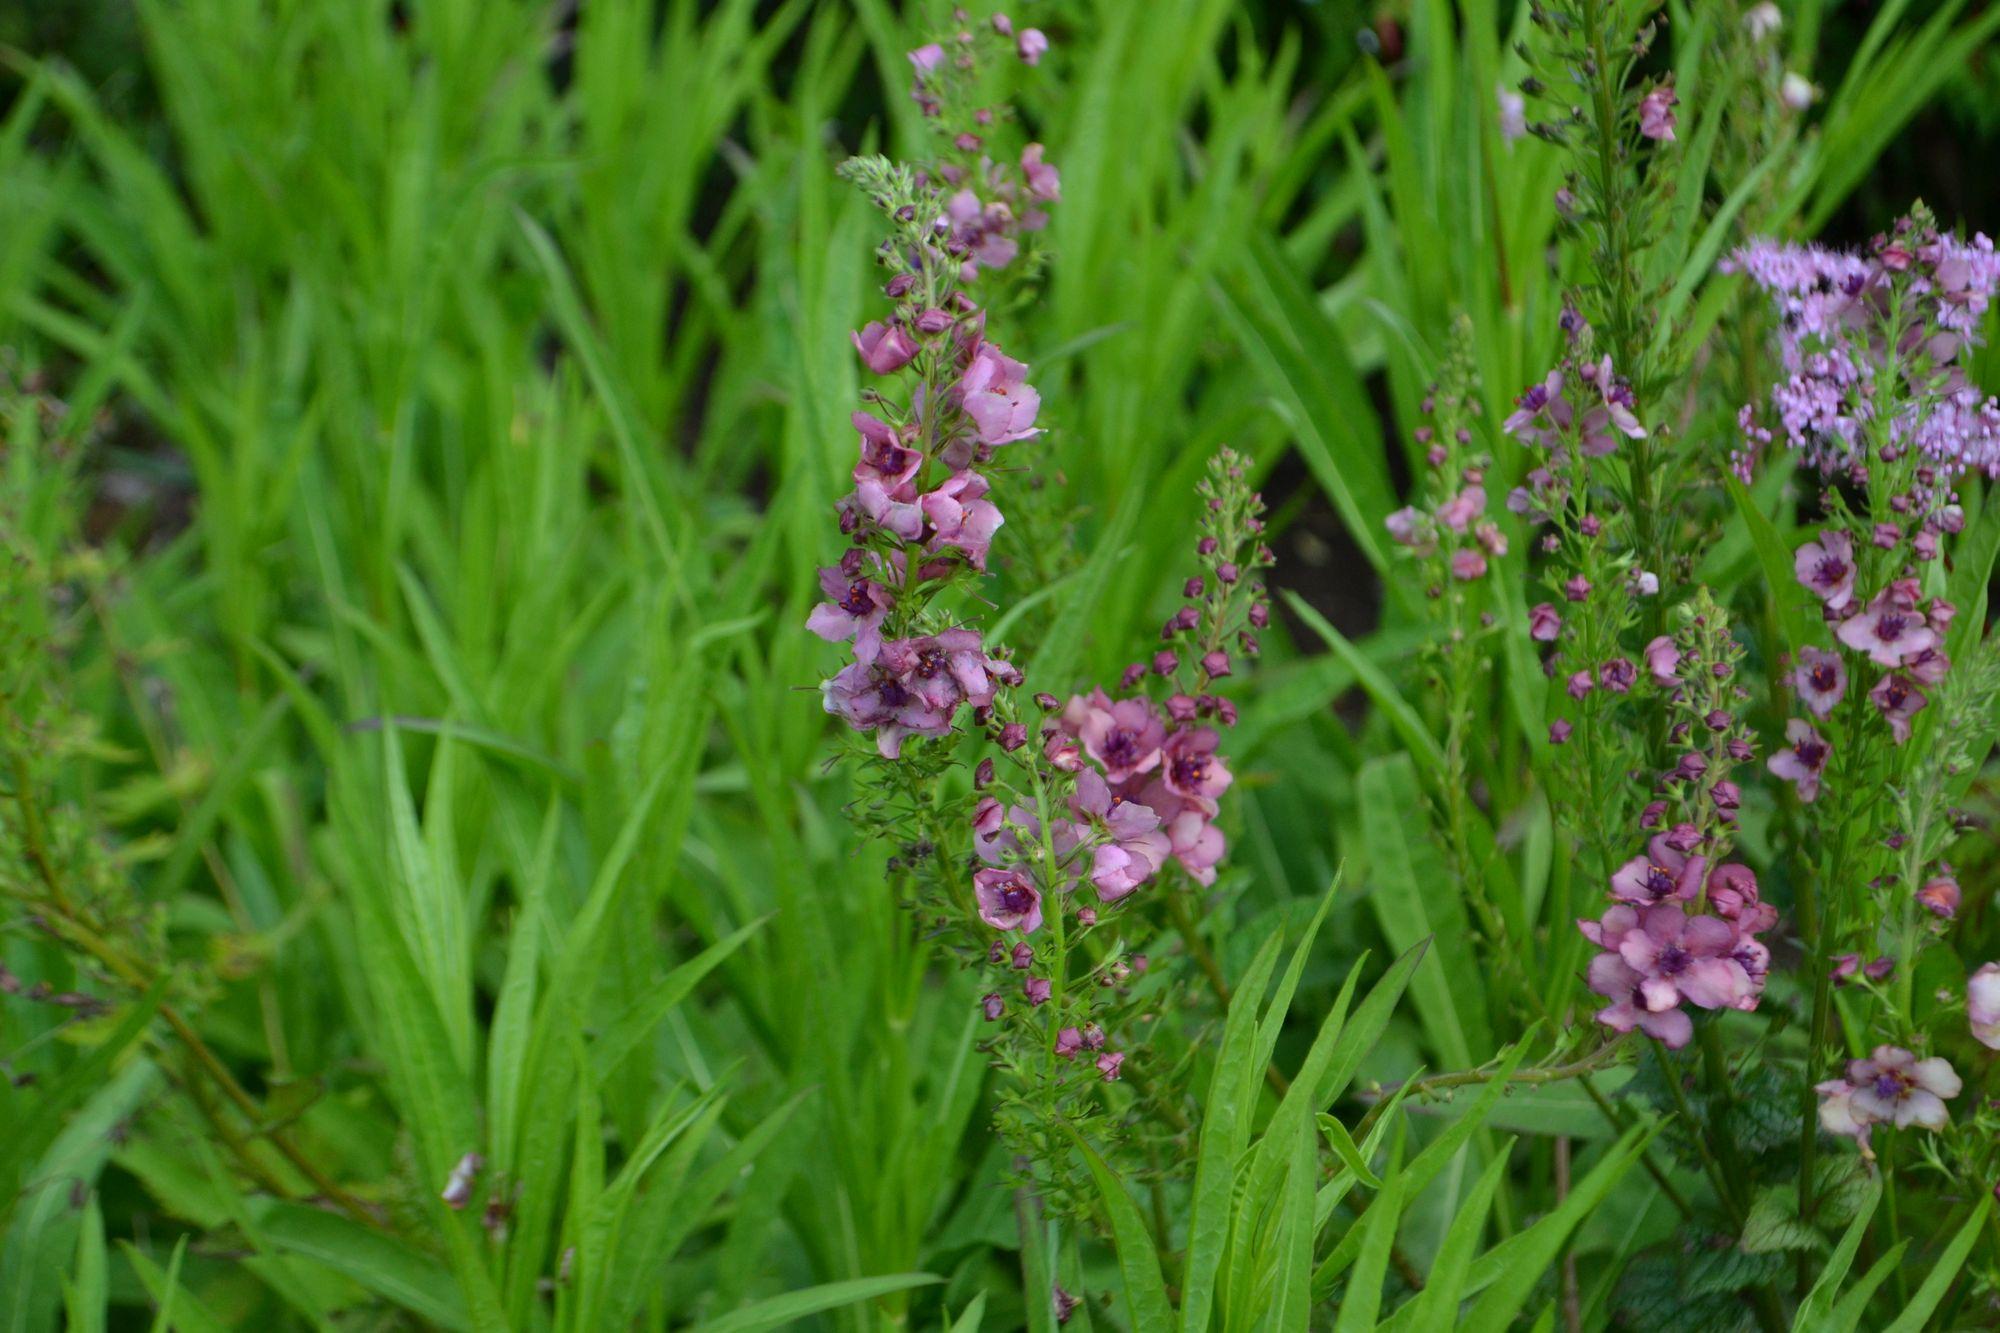 Tūbė 'Southern Charm' (Verbascum hybridum)